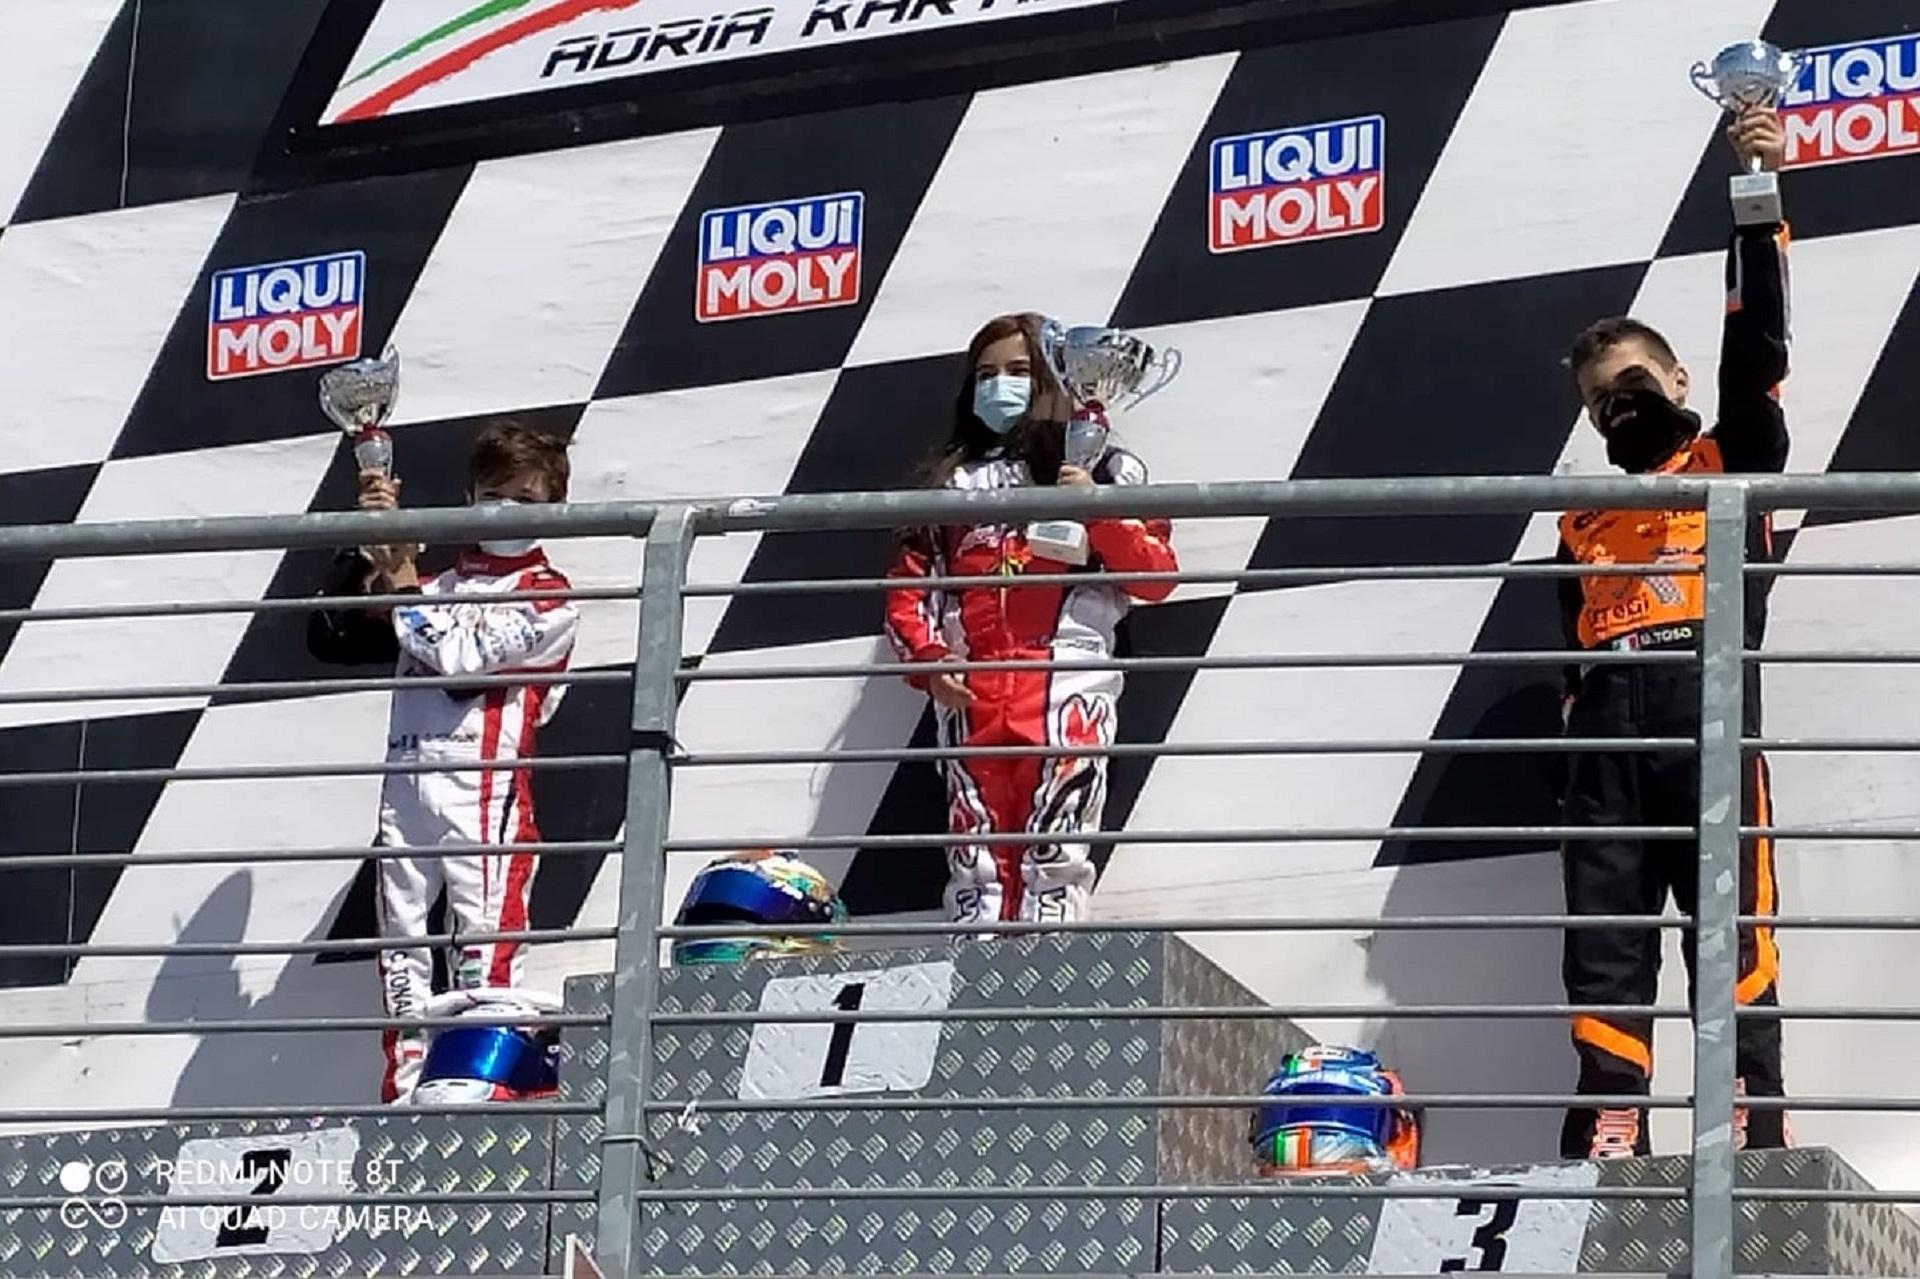 Maria Germano Neto fez soar 'A Portuguesa' no Adria Karting Raceway